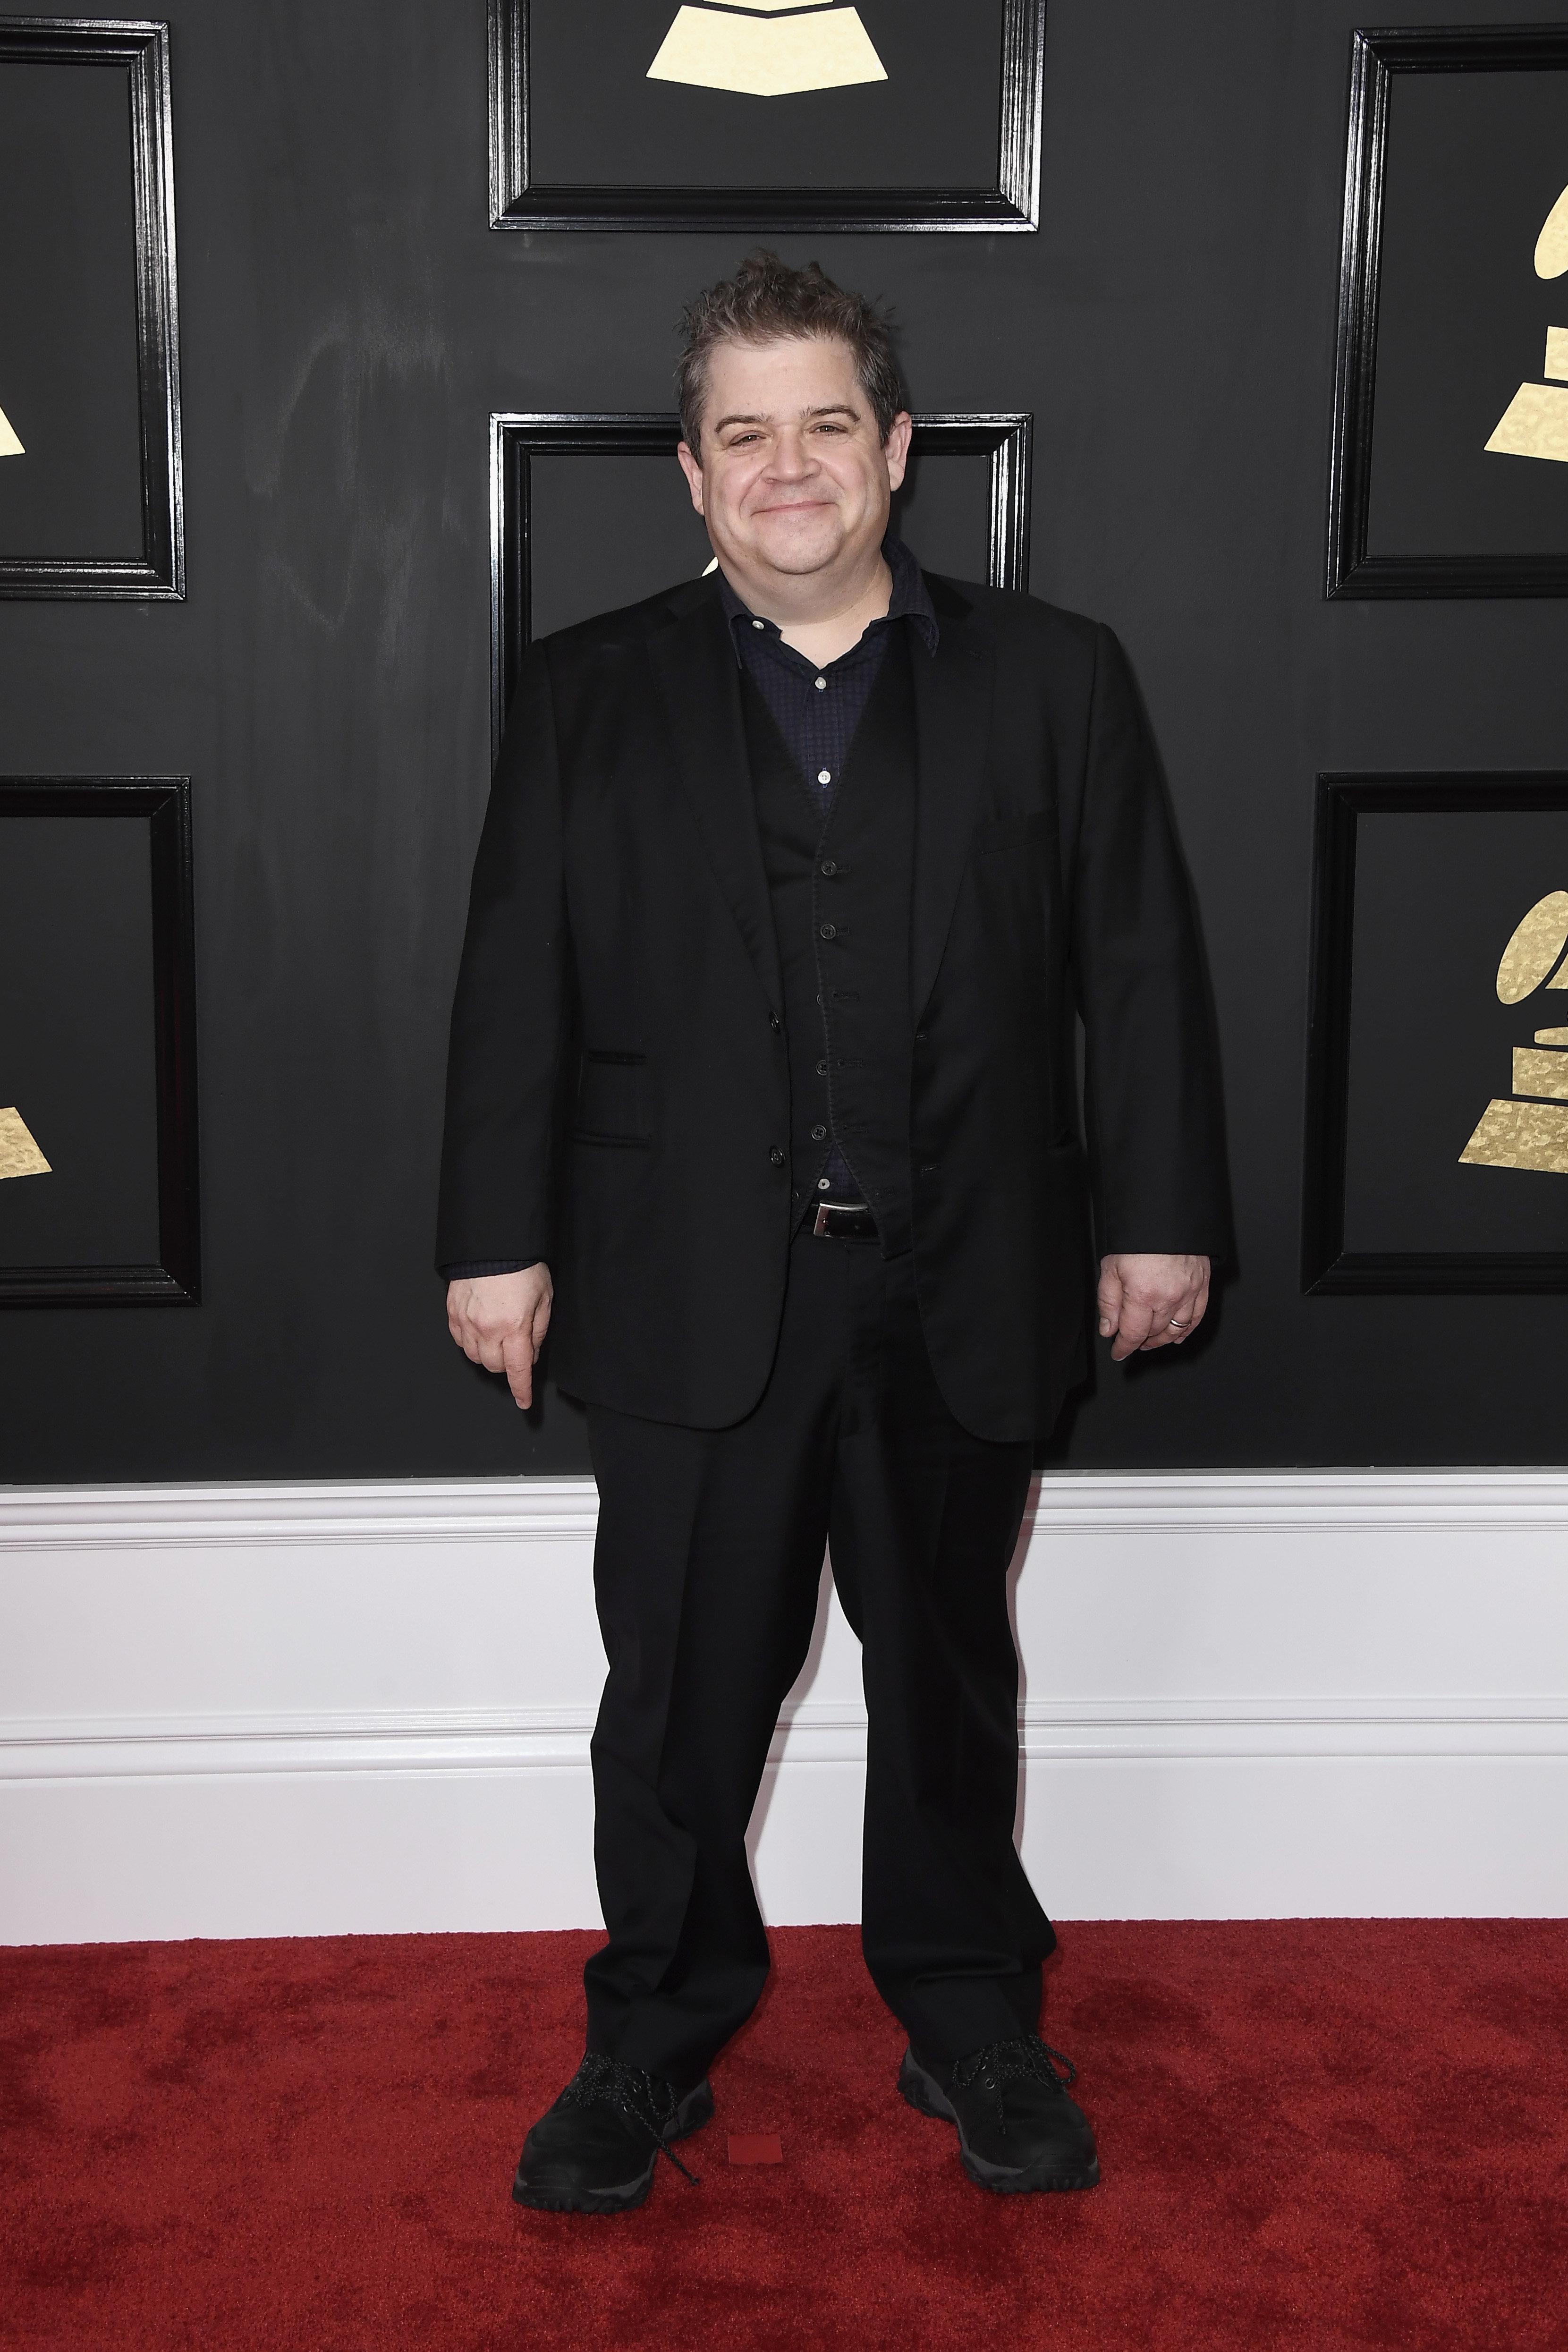 Patton Oswalt just won his first Grammy award.